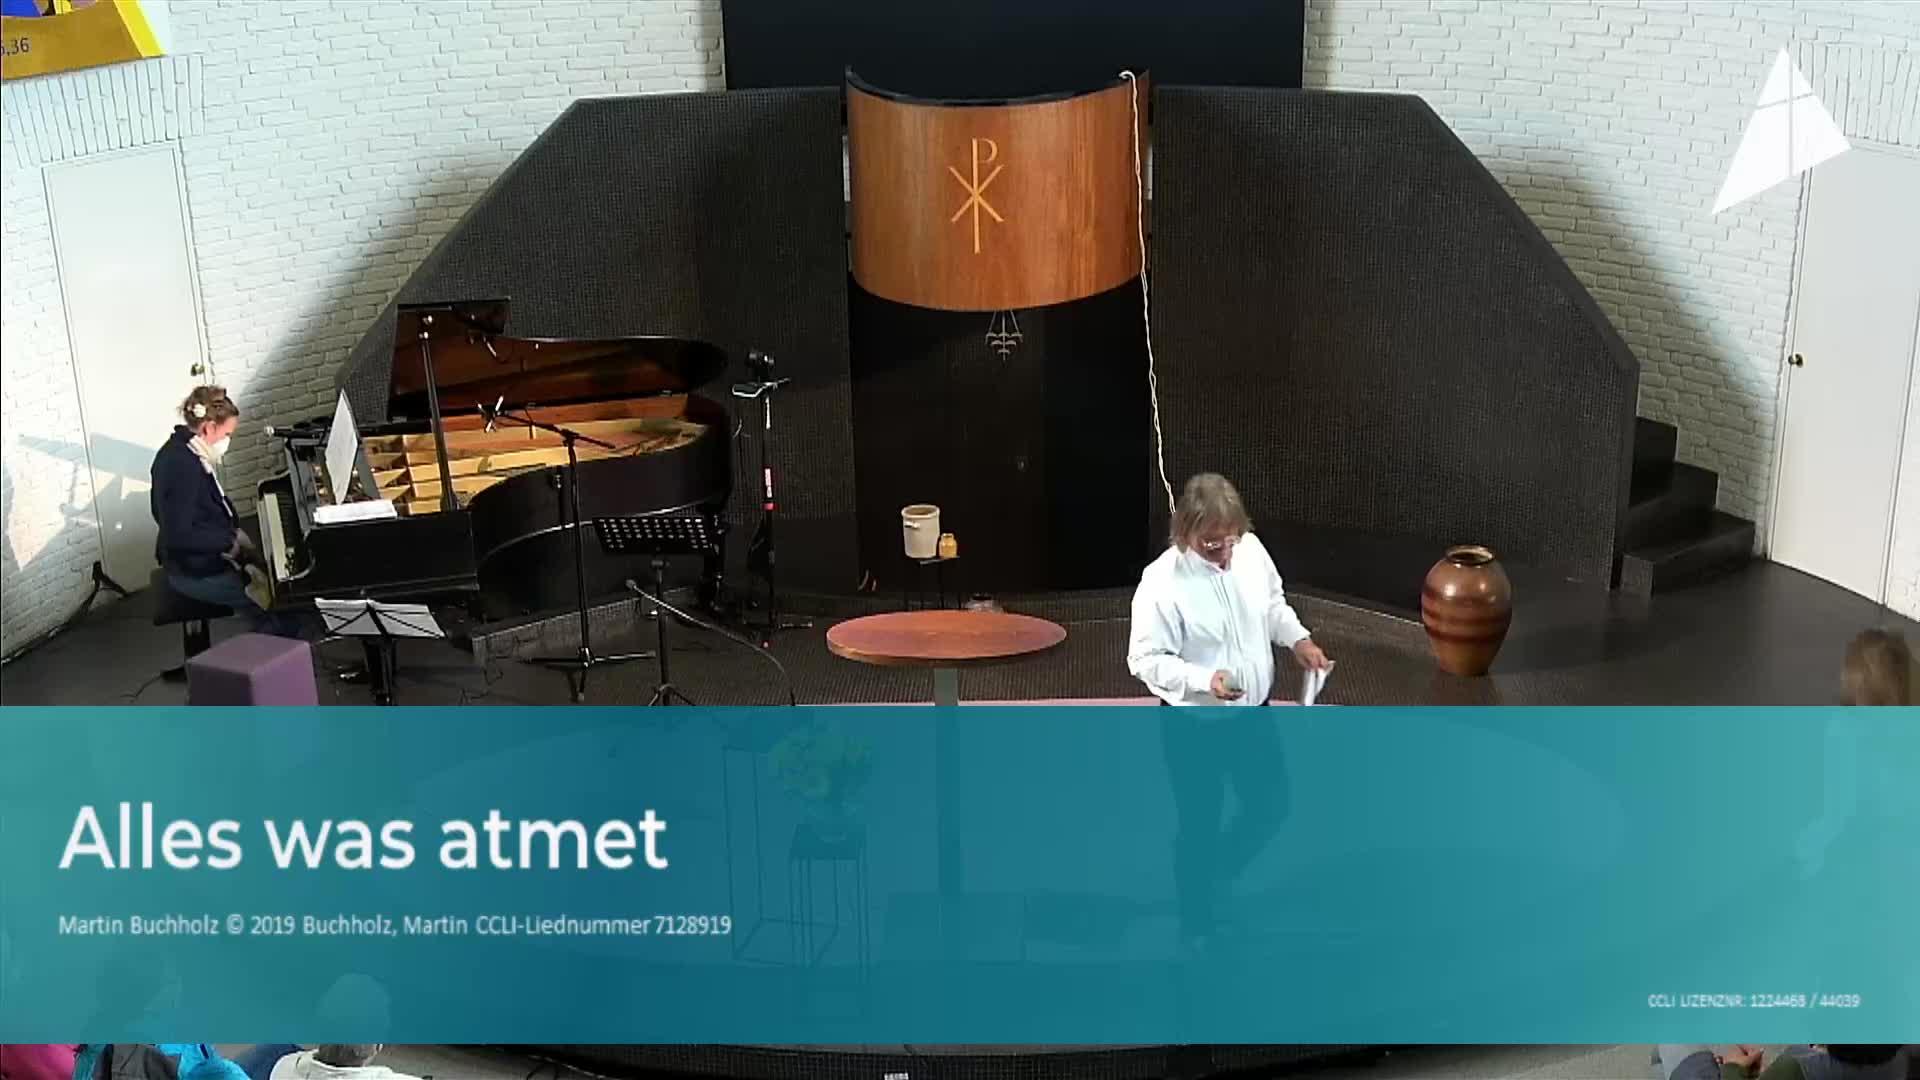 Gottesdienst - am 16. Mai - Livestream aus der Christuskirche Altona on 16-May-21-09:26:14